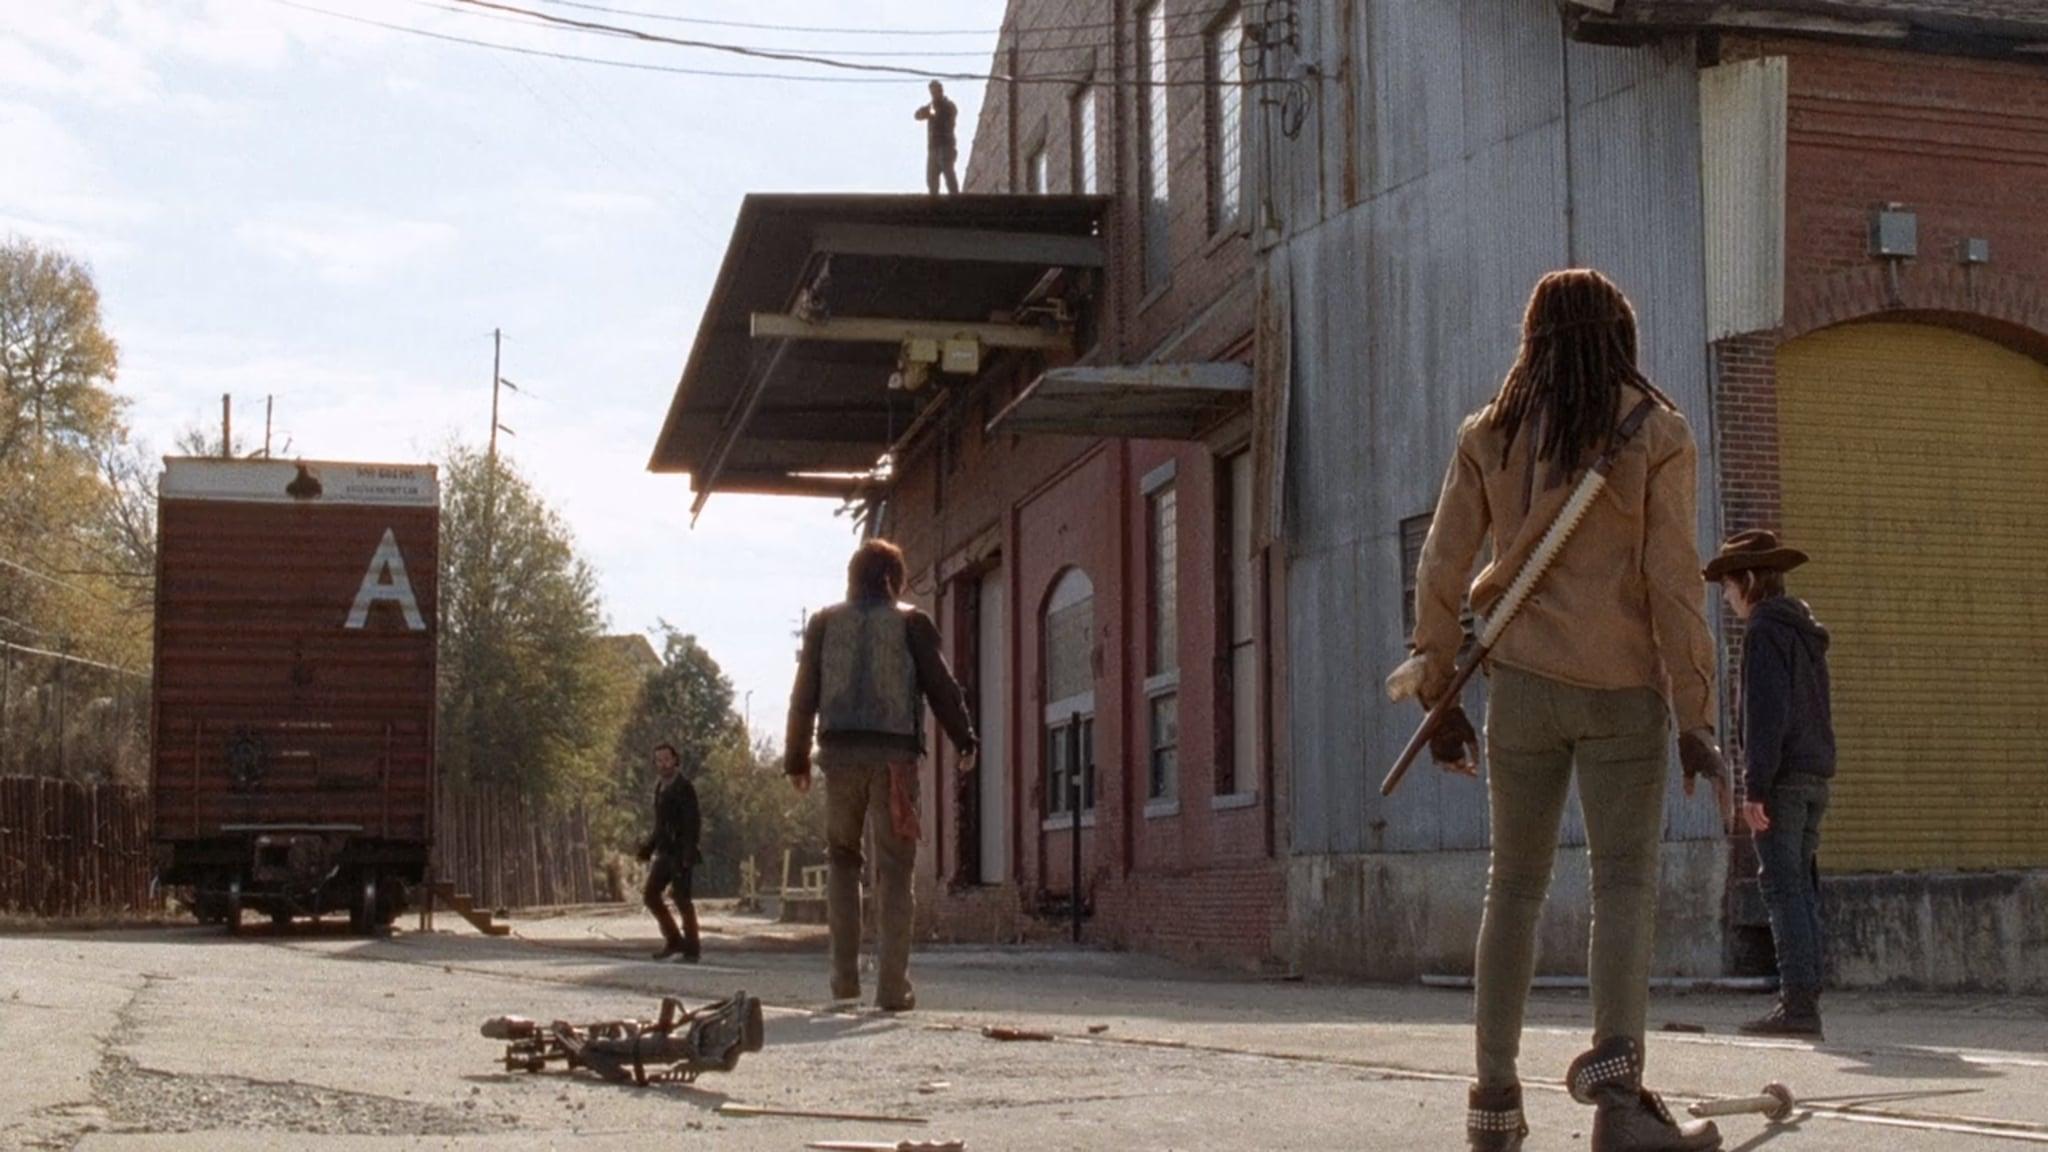 What does the letter a mean in the walking dead popsugar season 4 episode 16 biocorpaavc